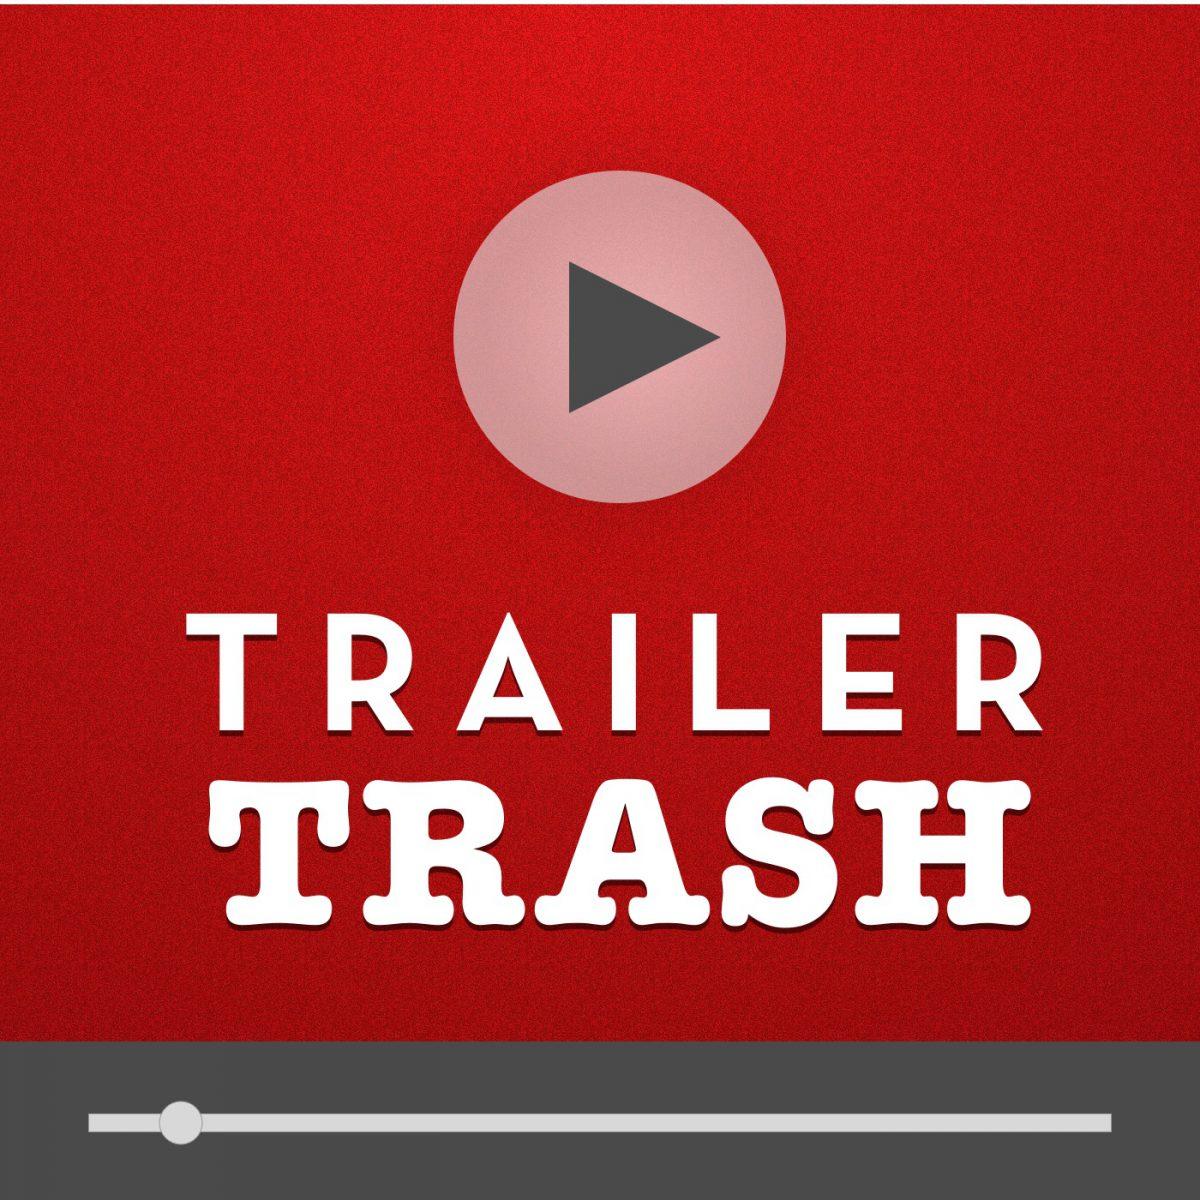 trailer-trash-art-1